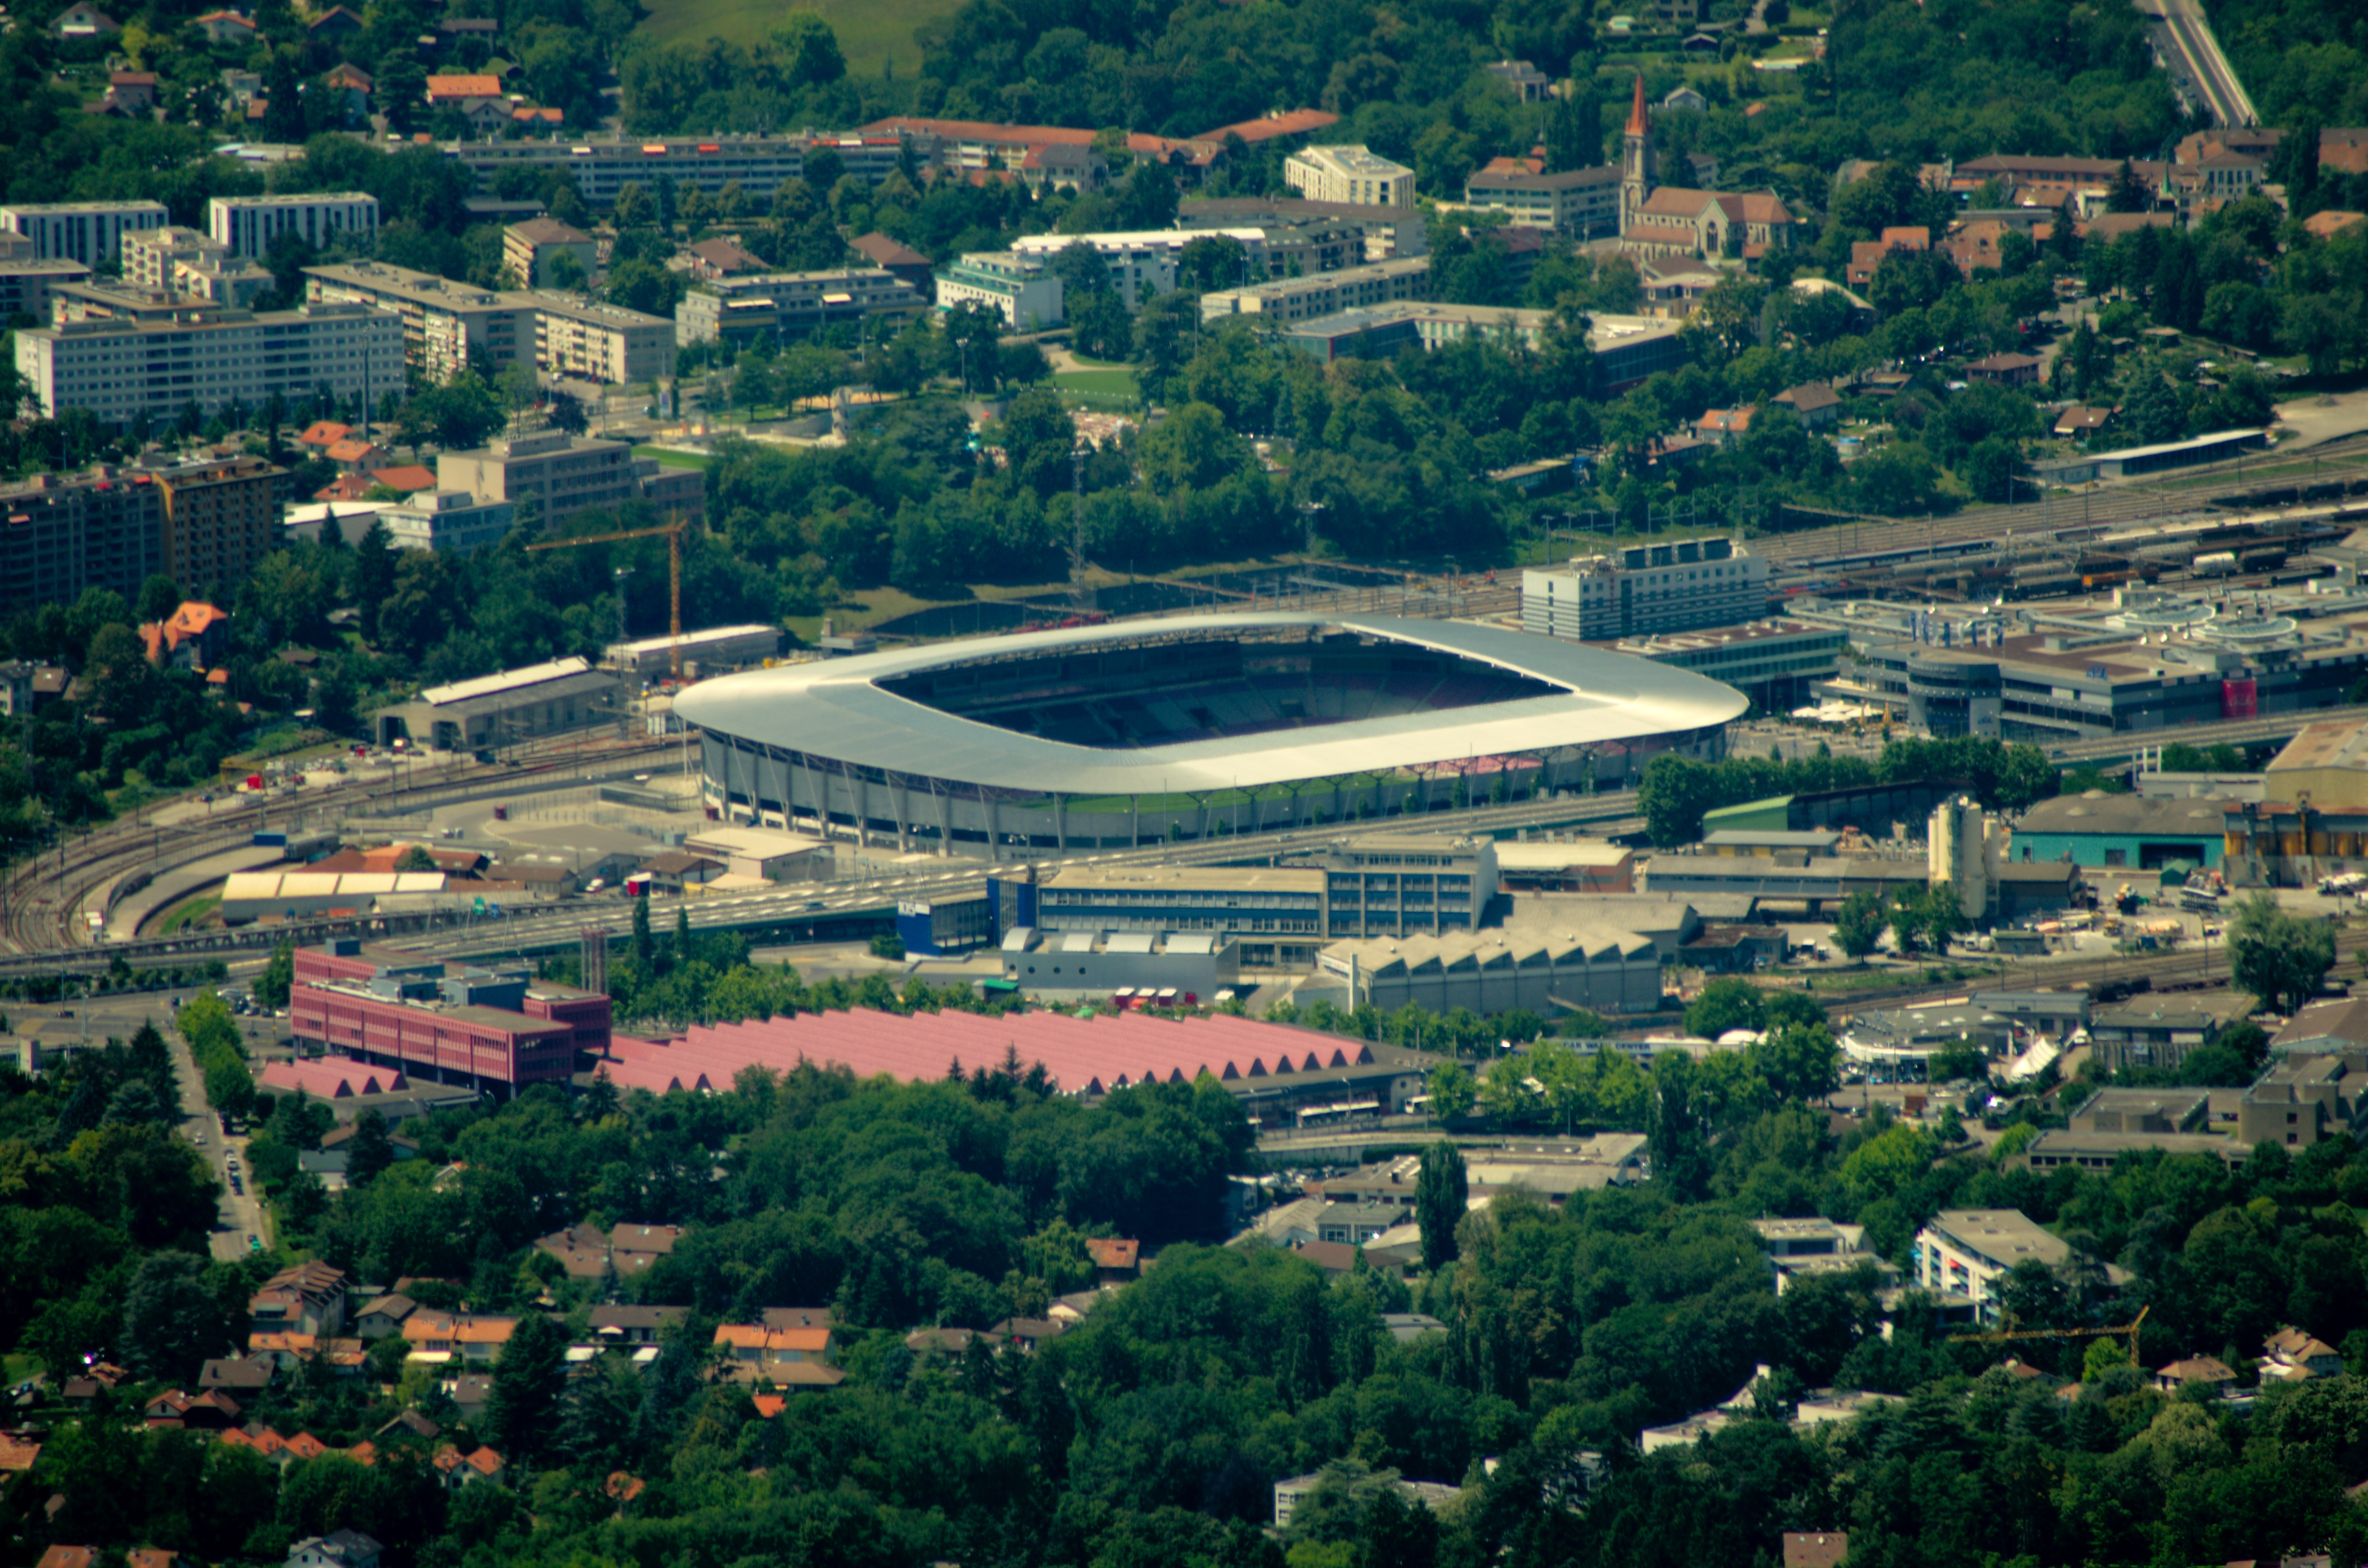 Stade_de_Genève_PAV-La Praille-Acacias-Vernets